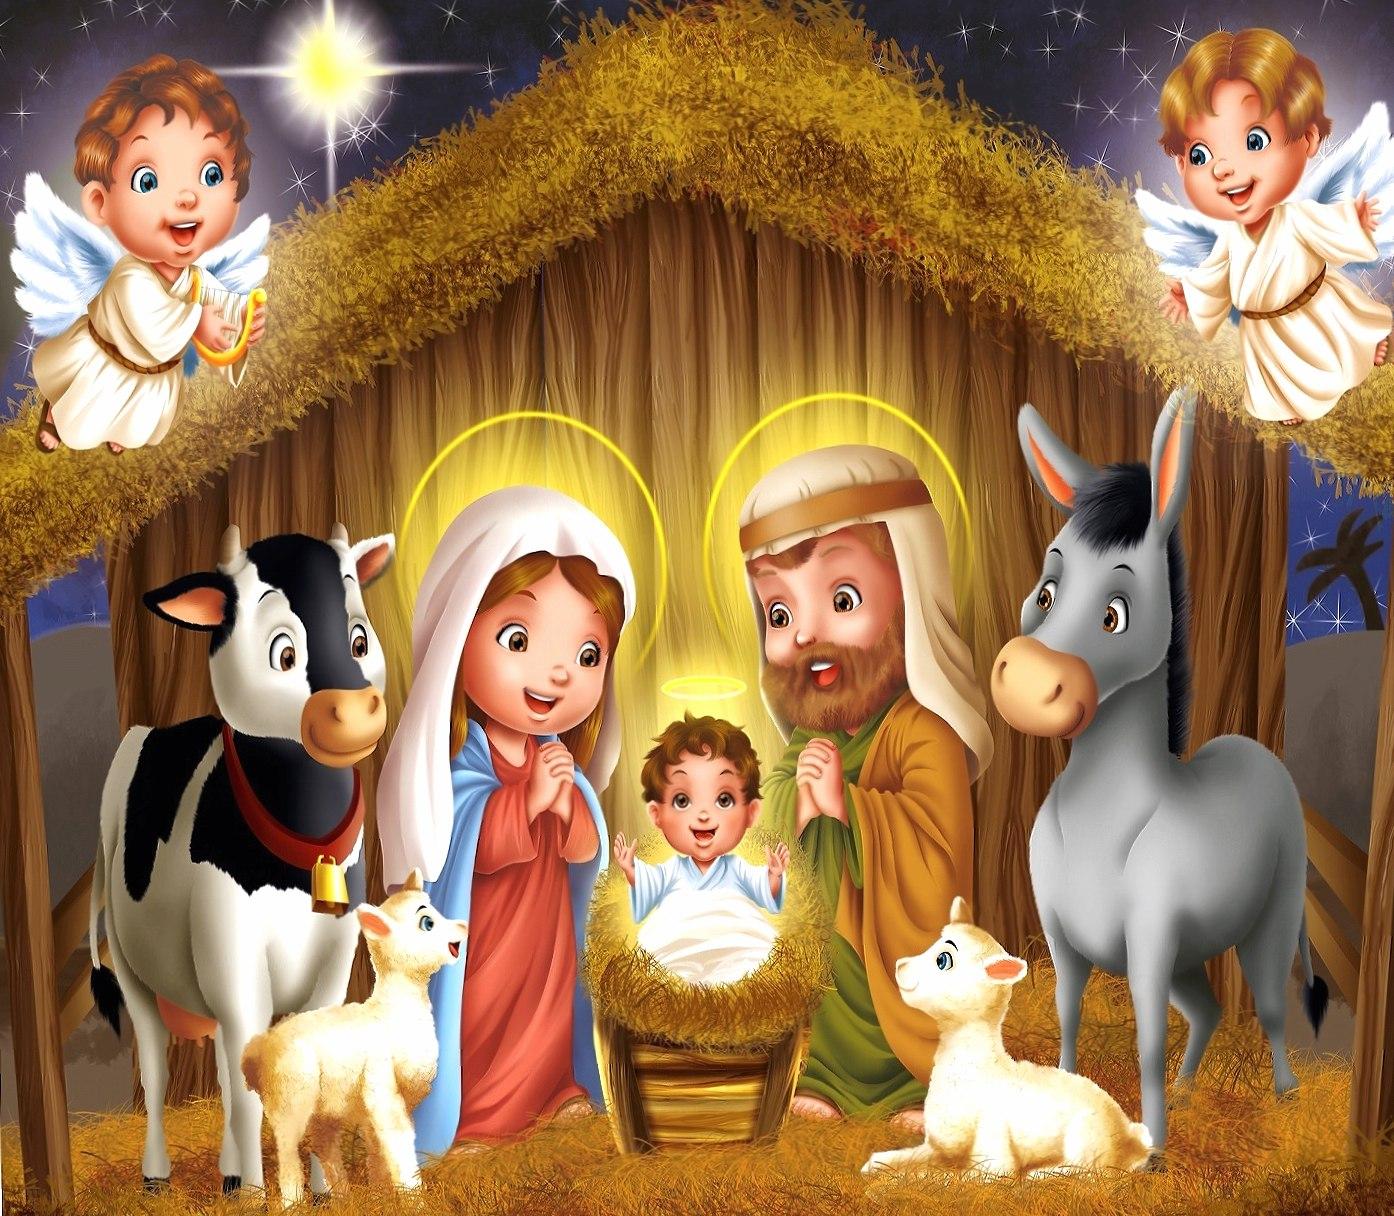 jesus birth wallpapers HD quality